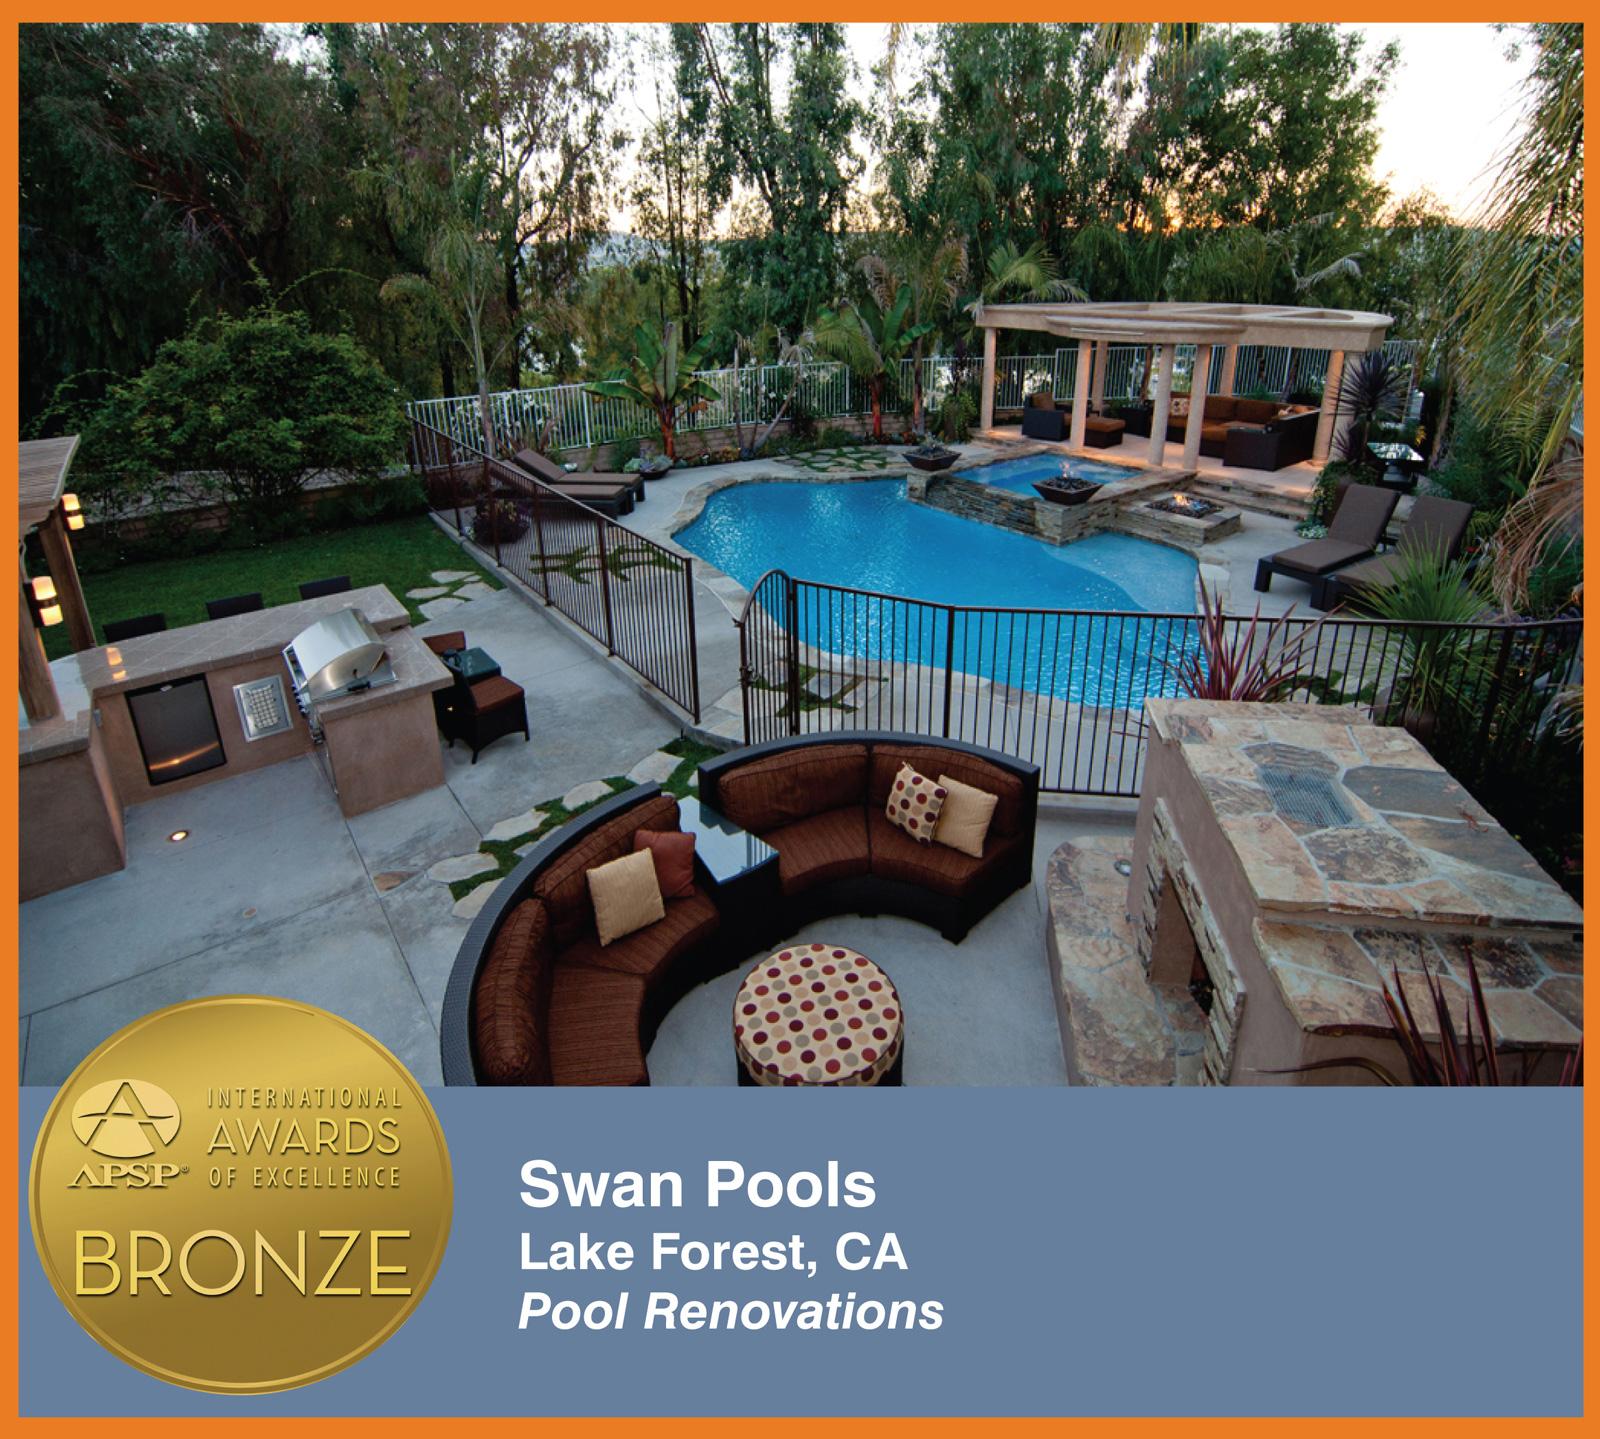 California pool builders win prestigious award in apsp - Swimming pool builders california ...